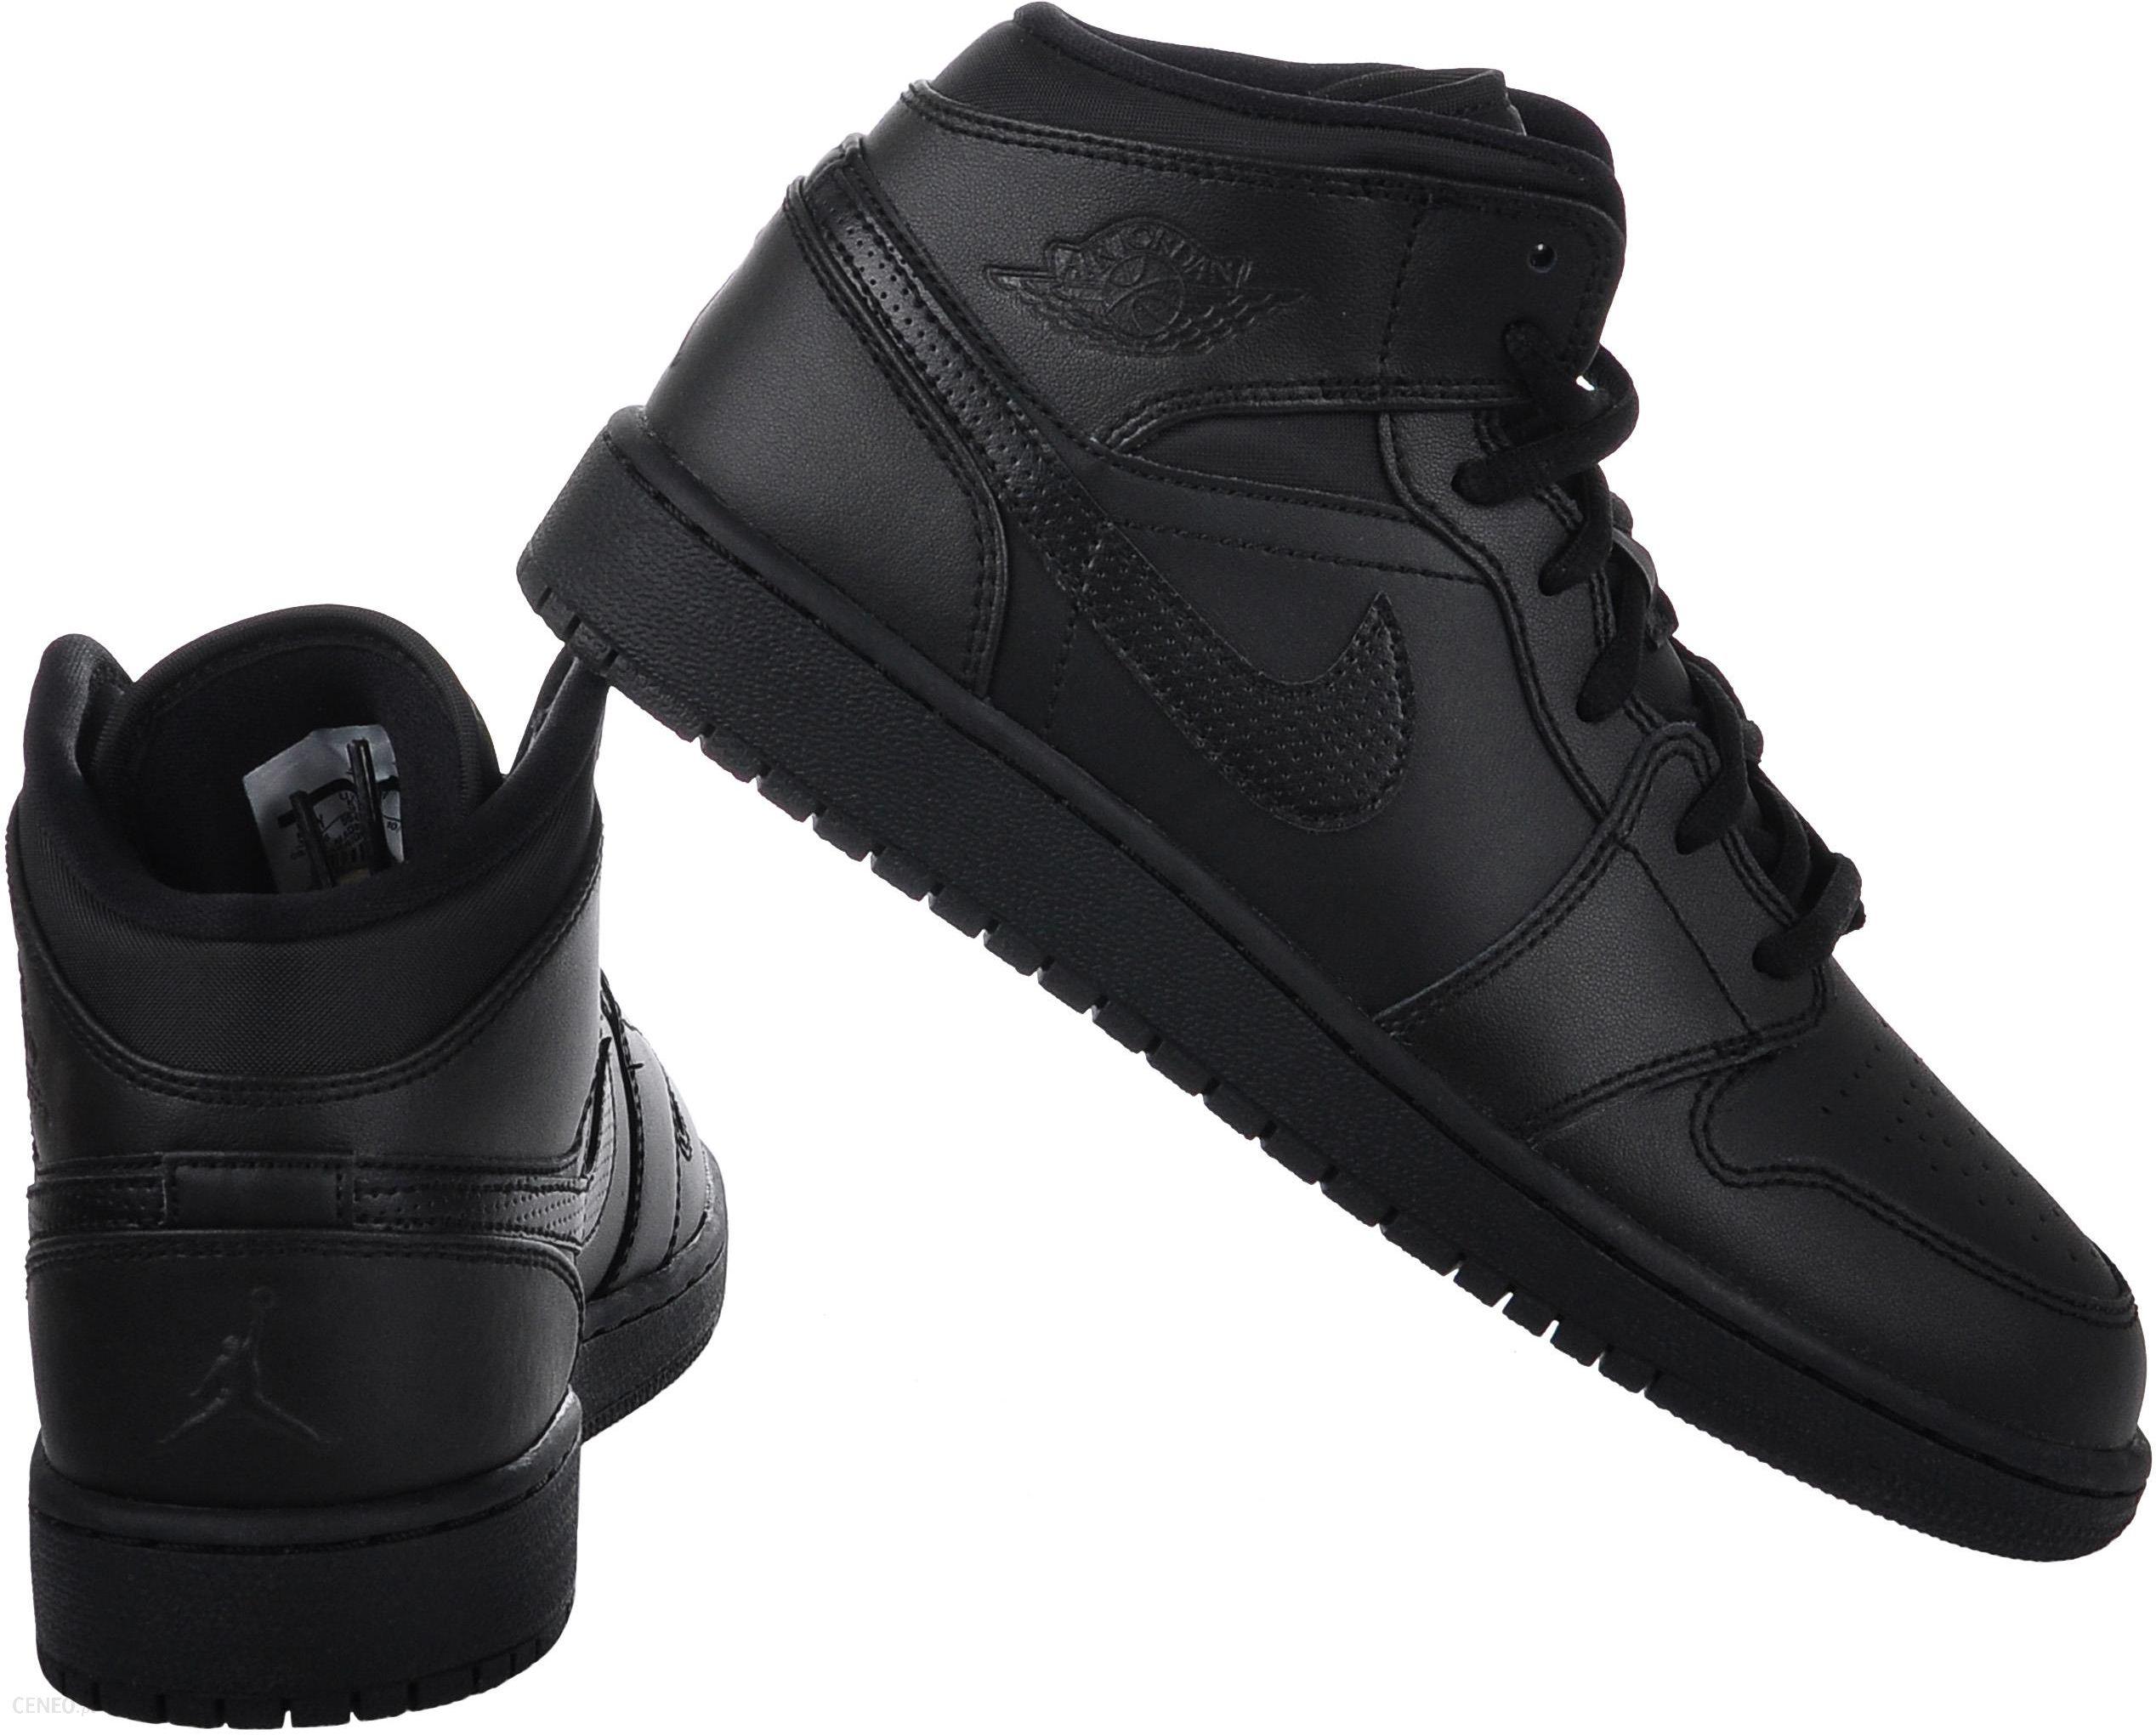 Buty Nike Air Jordan 1 MID Bg 554725 044 r.38,5 Ceny i opinie Ceneo.pl